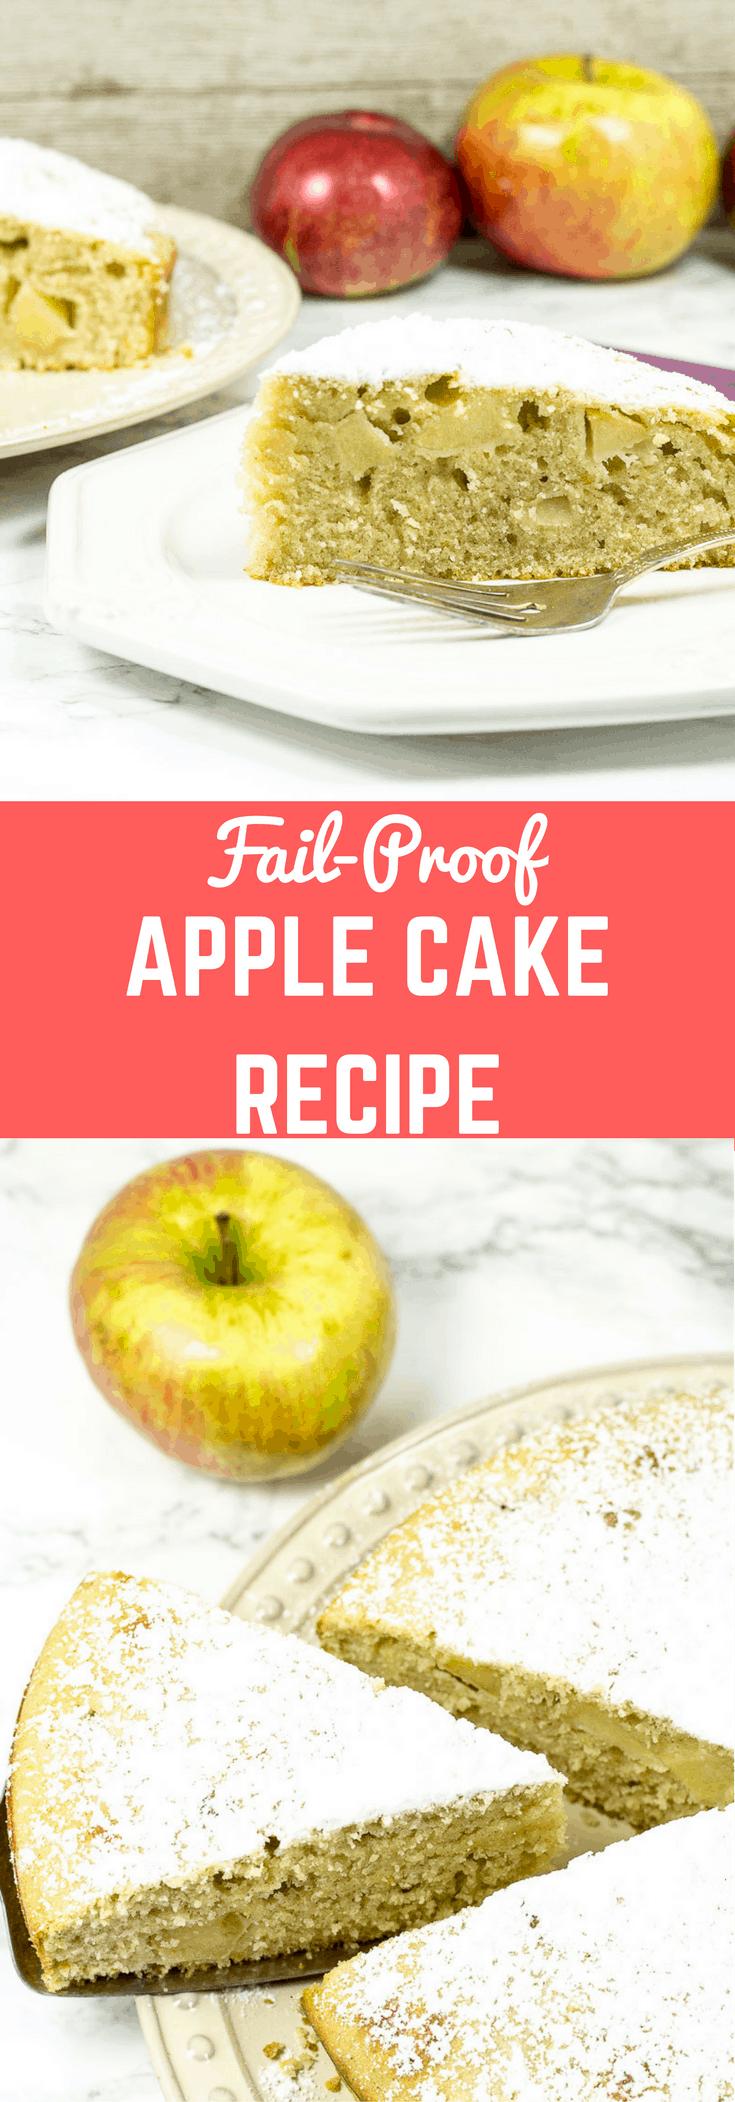 Apple Cake Apples Recipes Fresh Easy Mix Cake